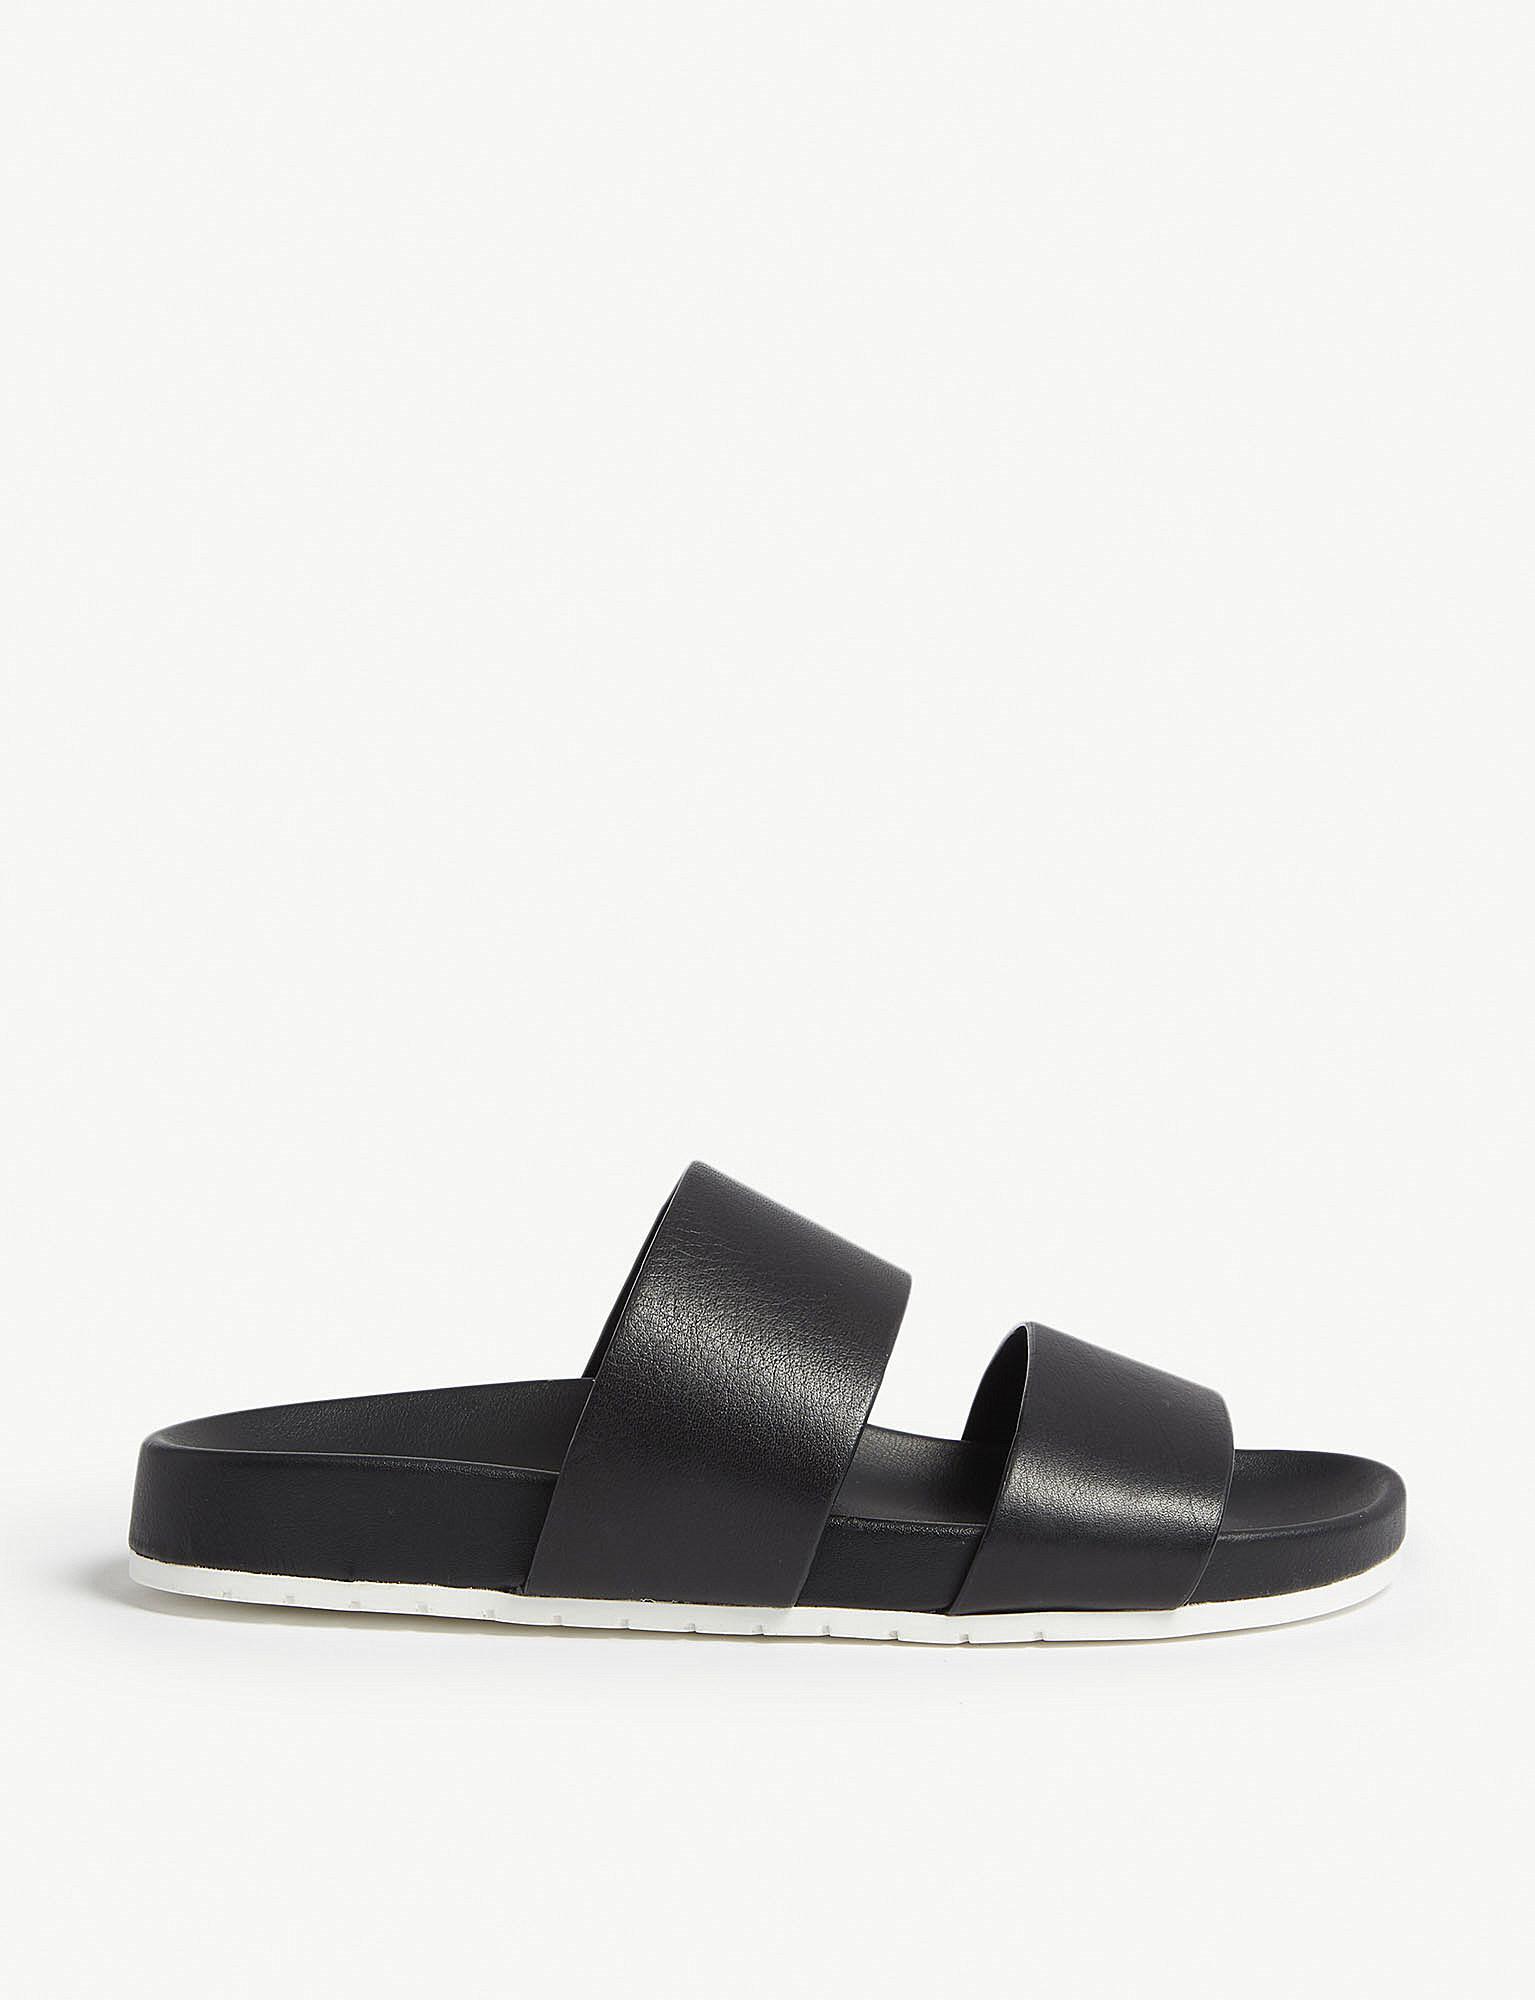 909d1b4ad11 Lyst - ALDO Eraveth Sandals in Black